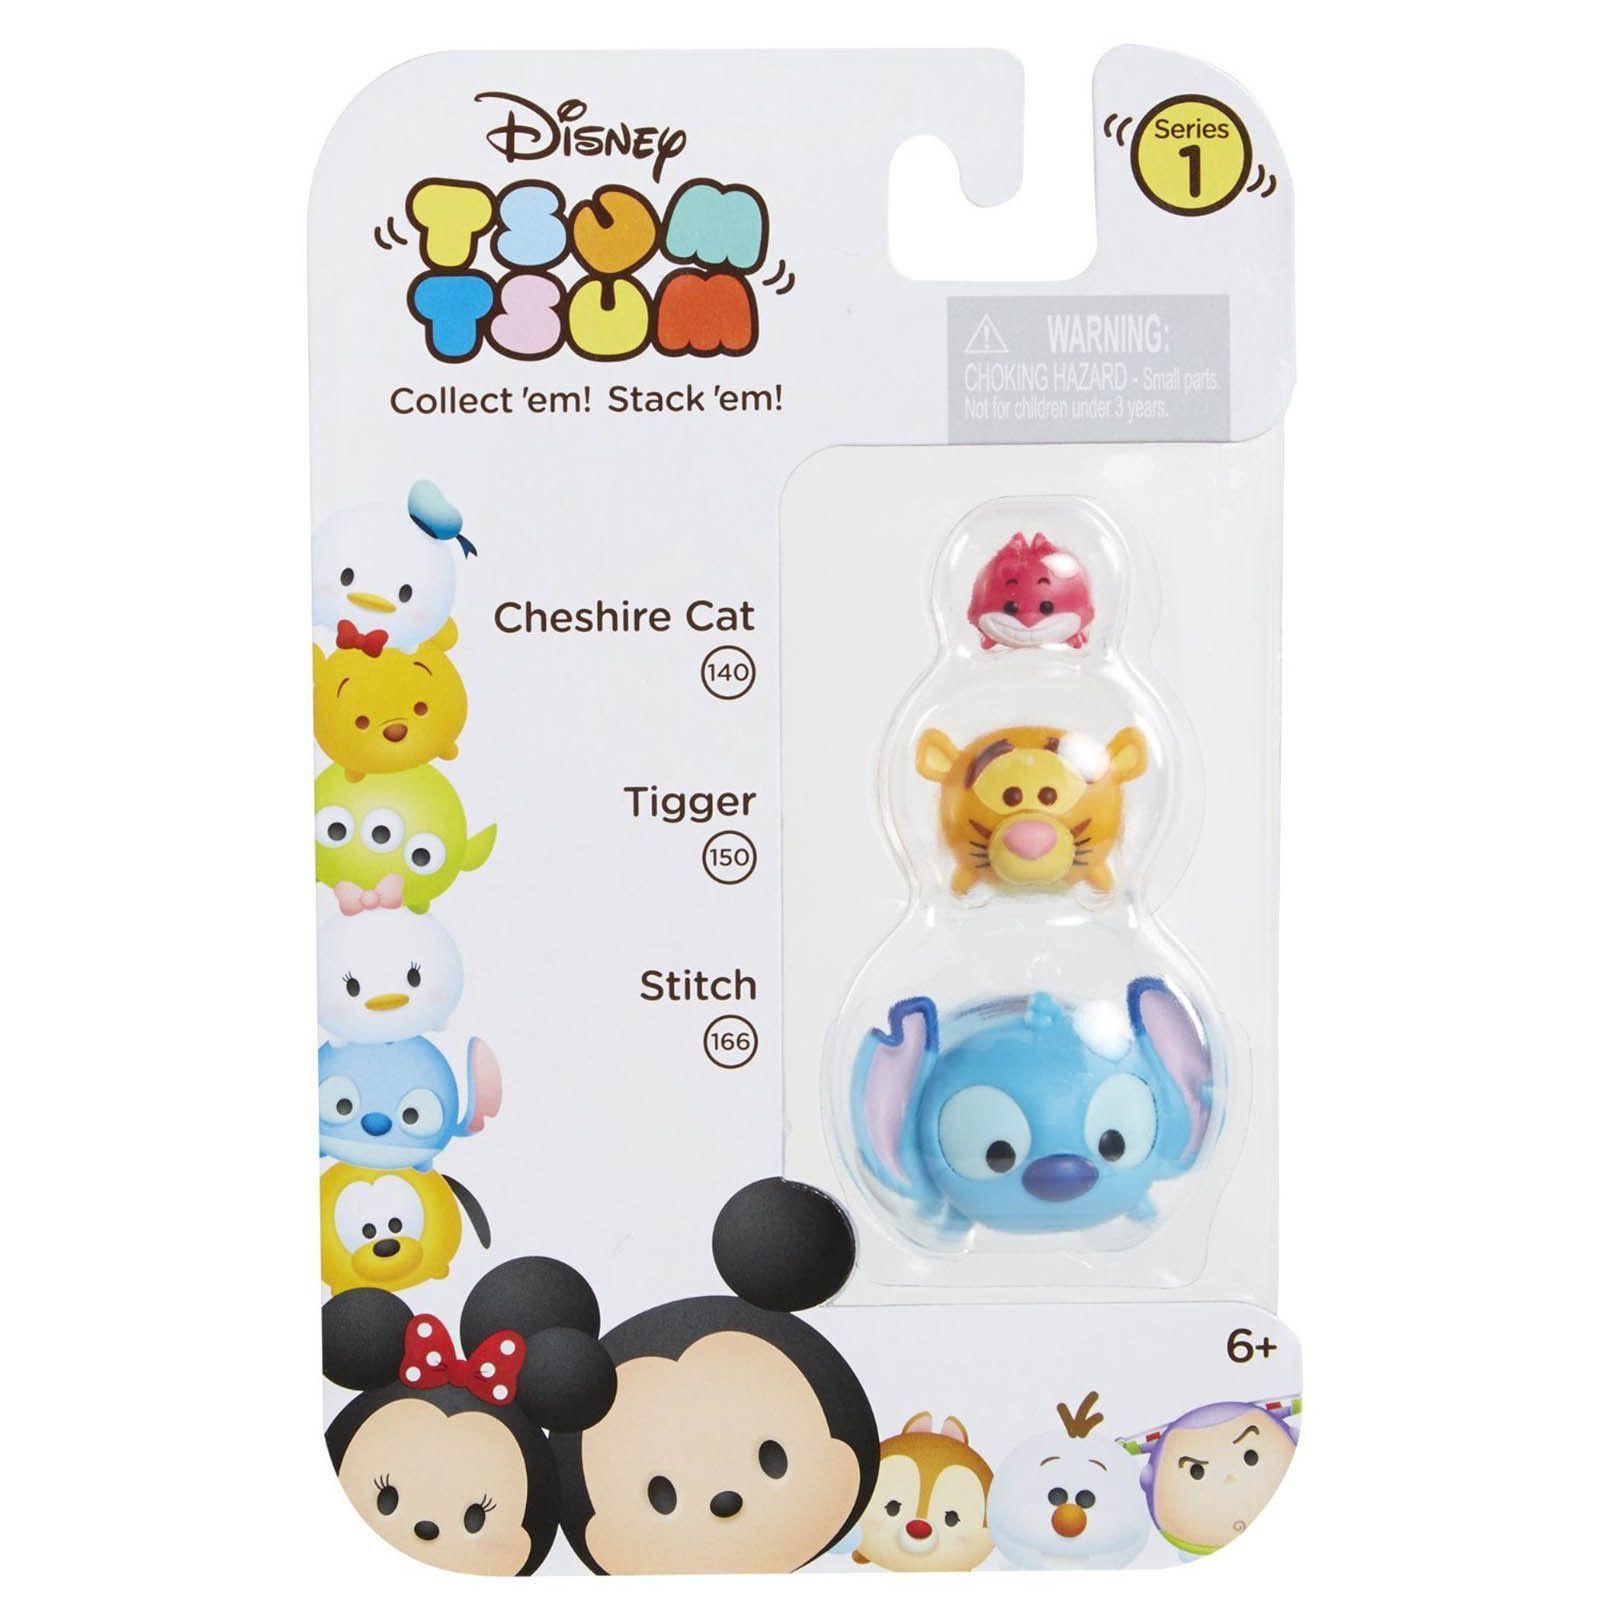 Disney Tsum Tsum Series 1 Cheshire Cat Tigger Stitch Figures 3 Pack